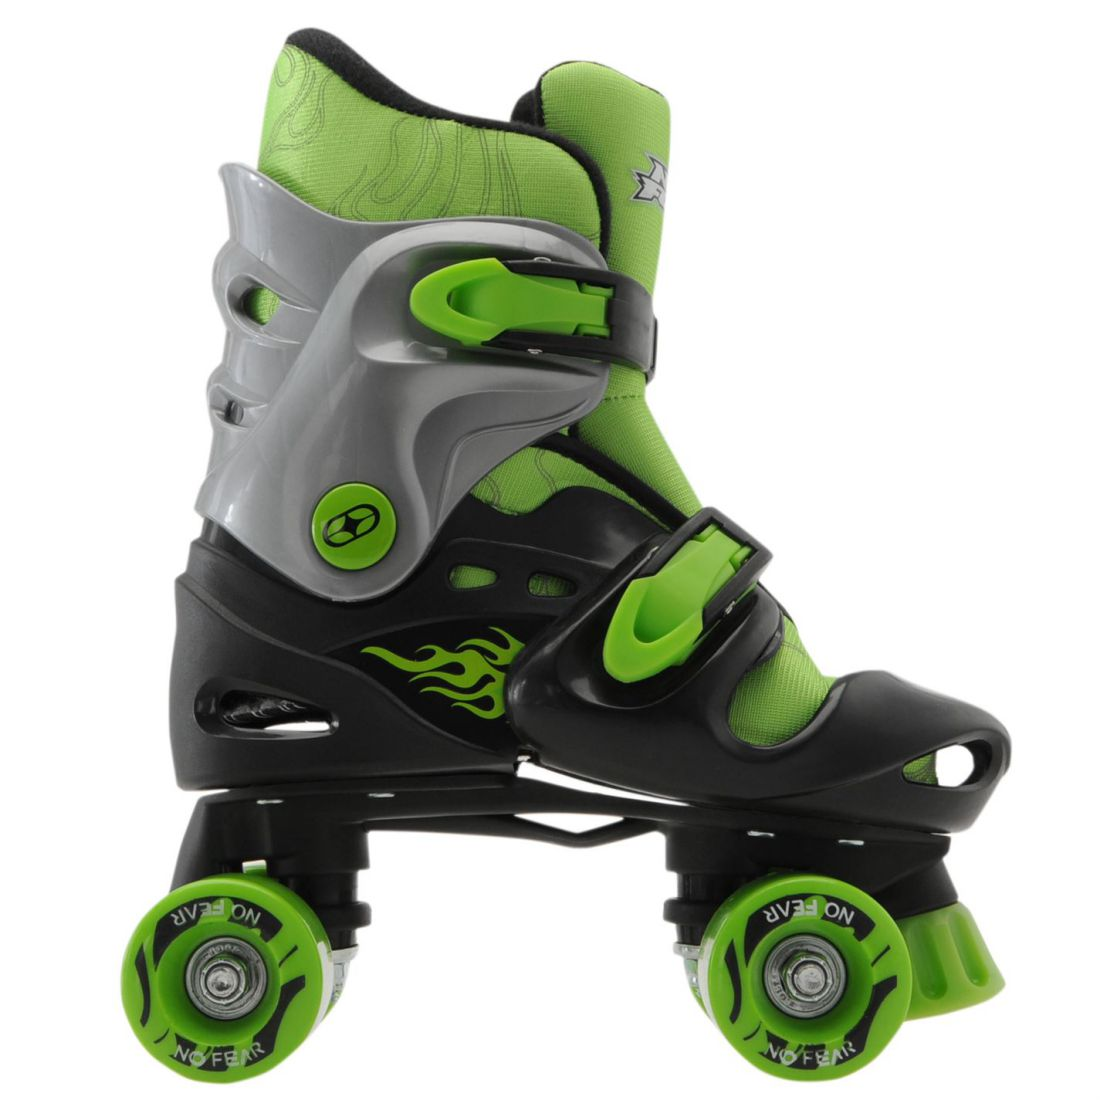 No Fear Kids Quad Skates Boys Skate Shoes Rollers Wheeled Black ... 50cb9b04a